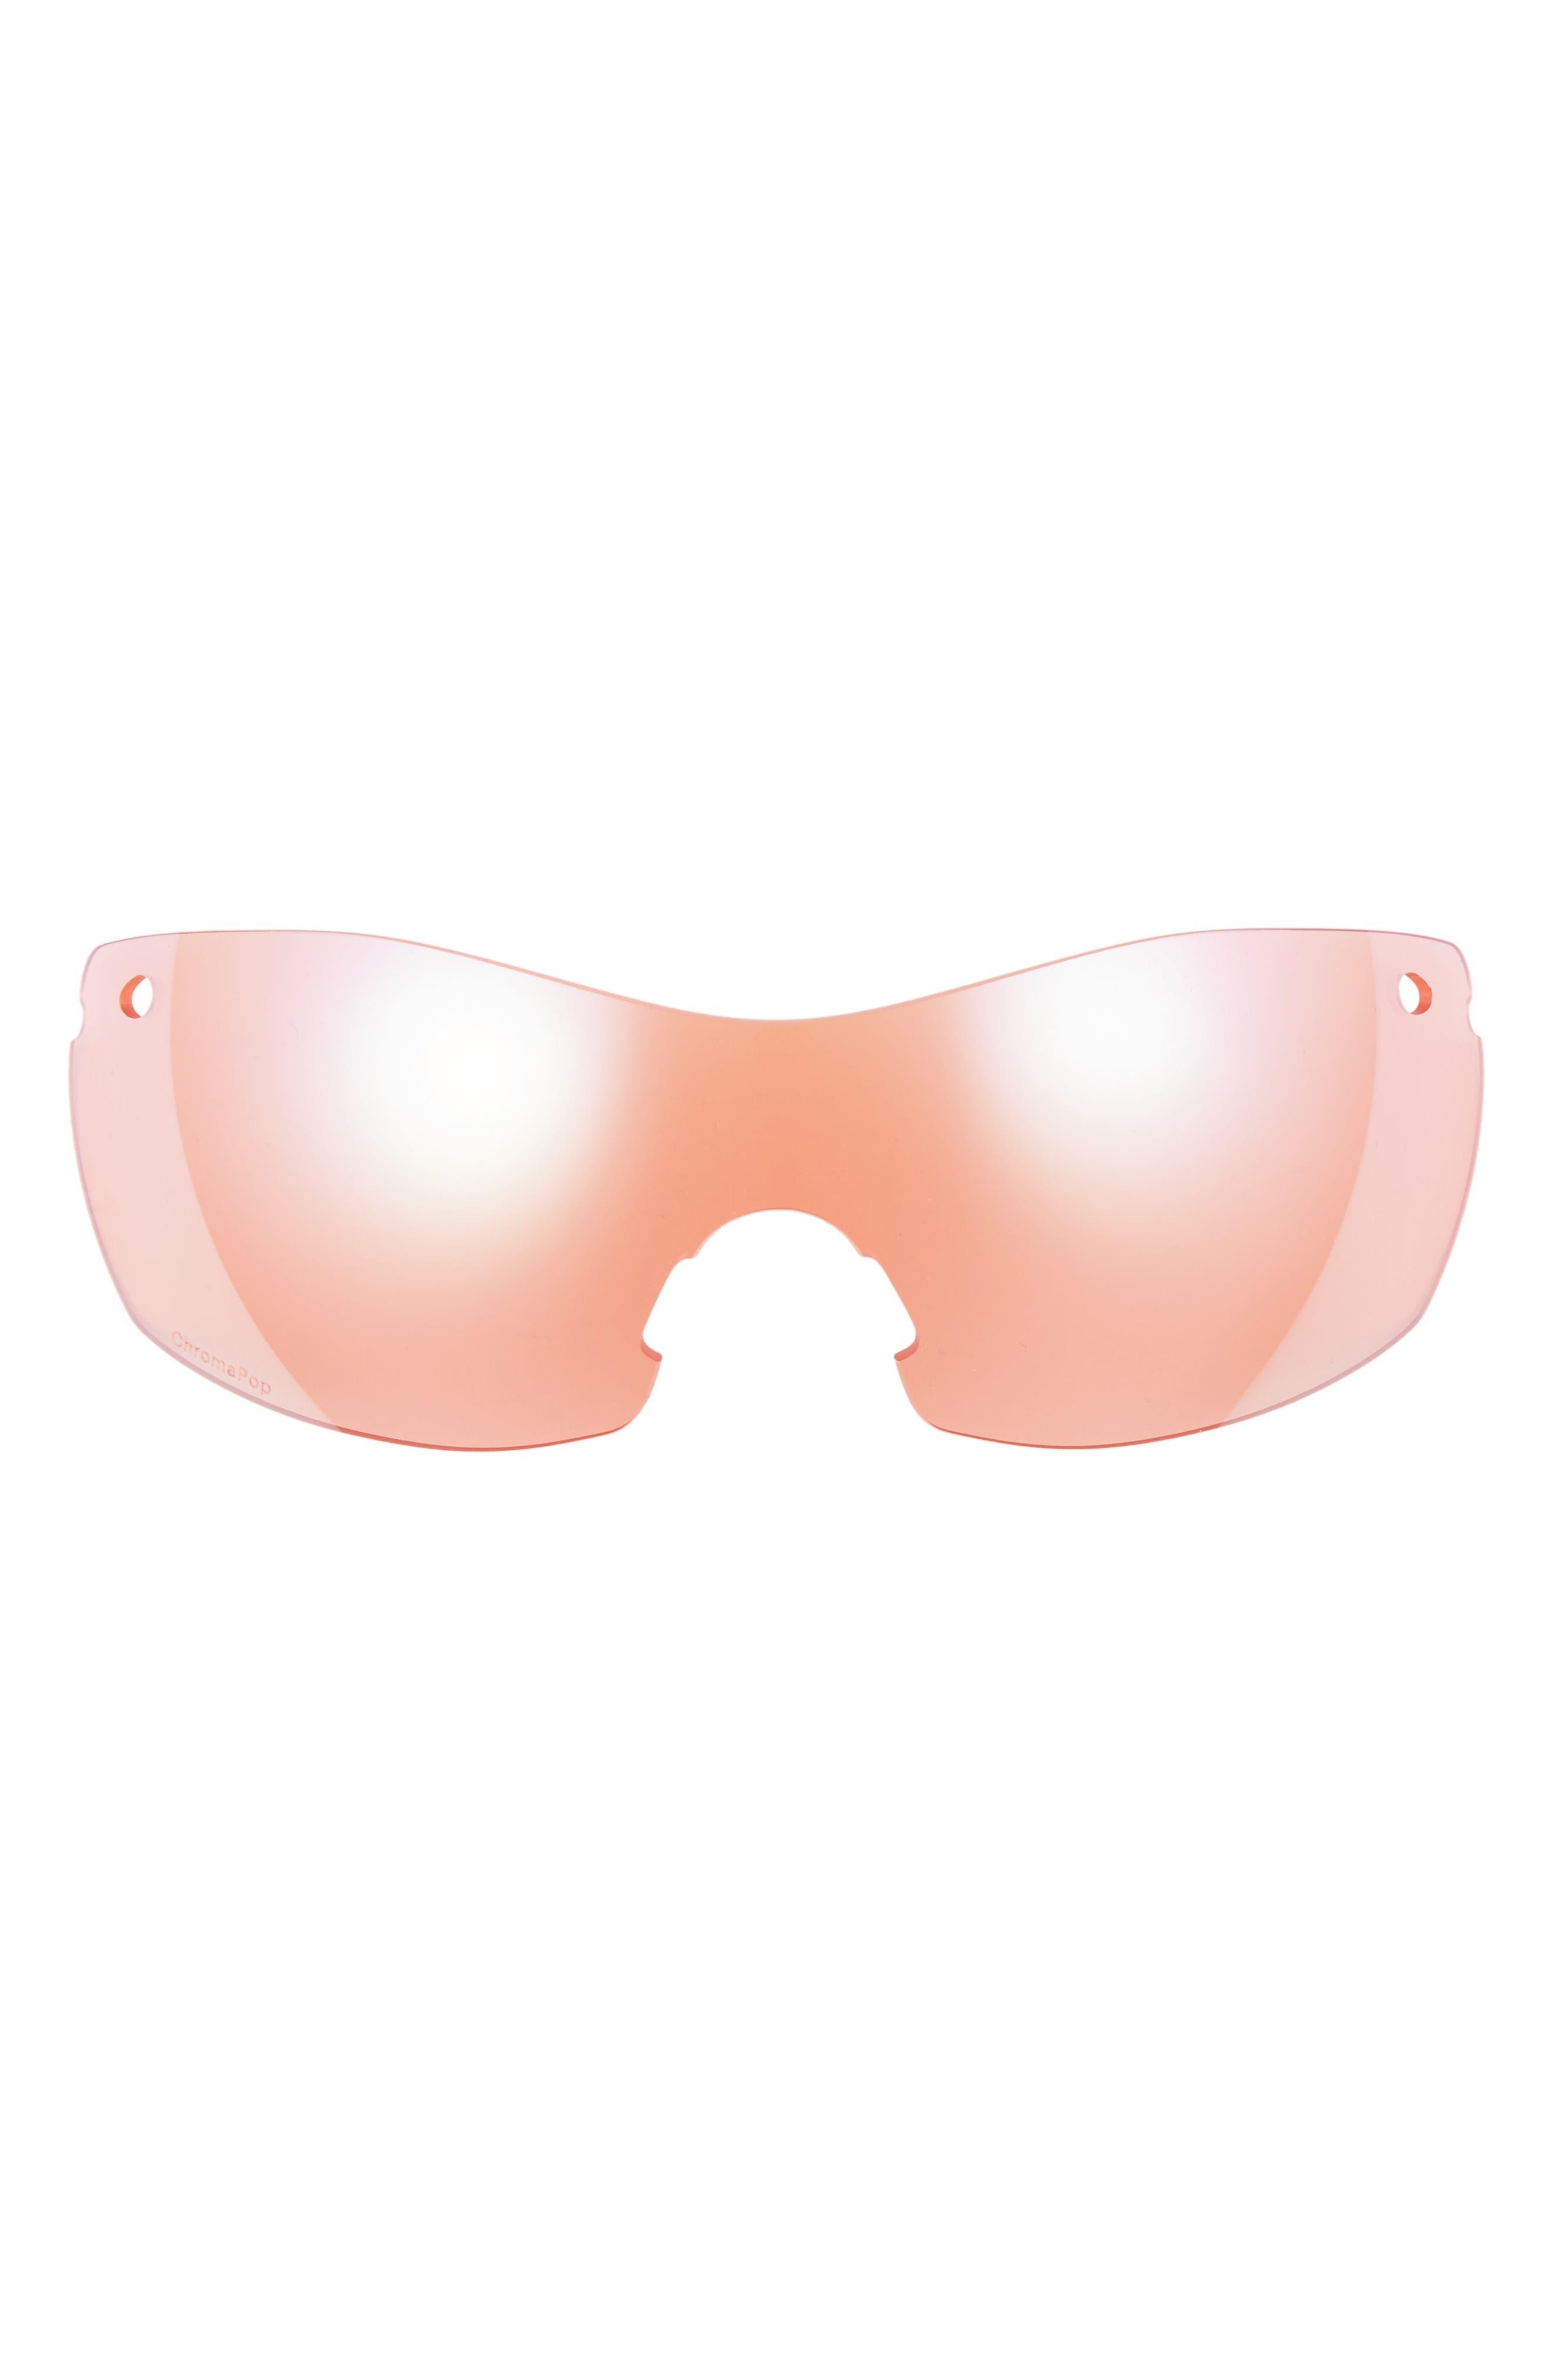 PivLock<sup>™</sup> Asana 150mm ChromaPop Polarized Sunglasses,                             Alternate thumbnail 17, color,